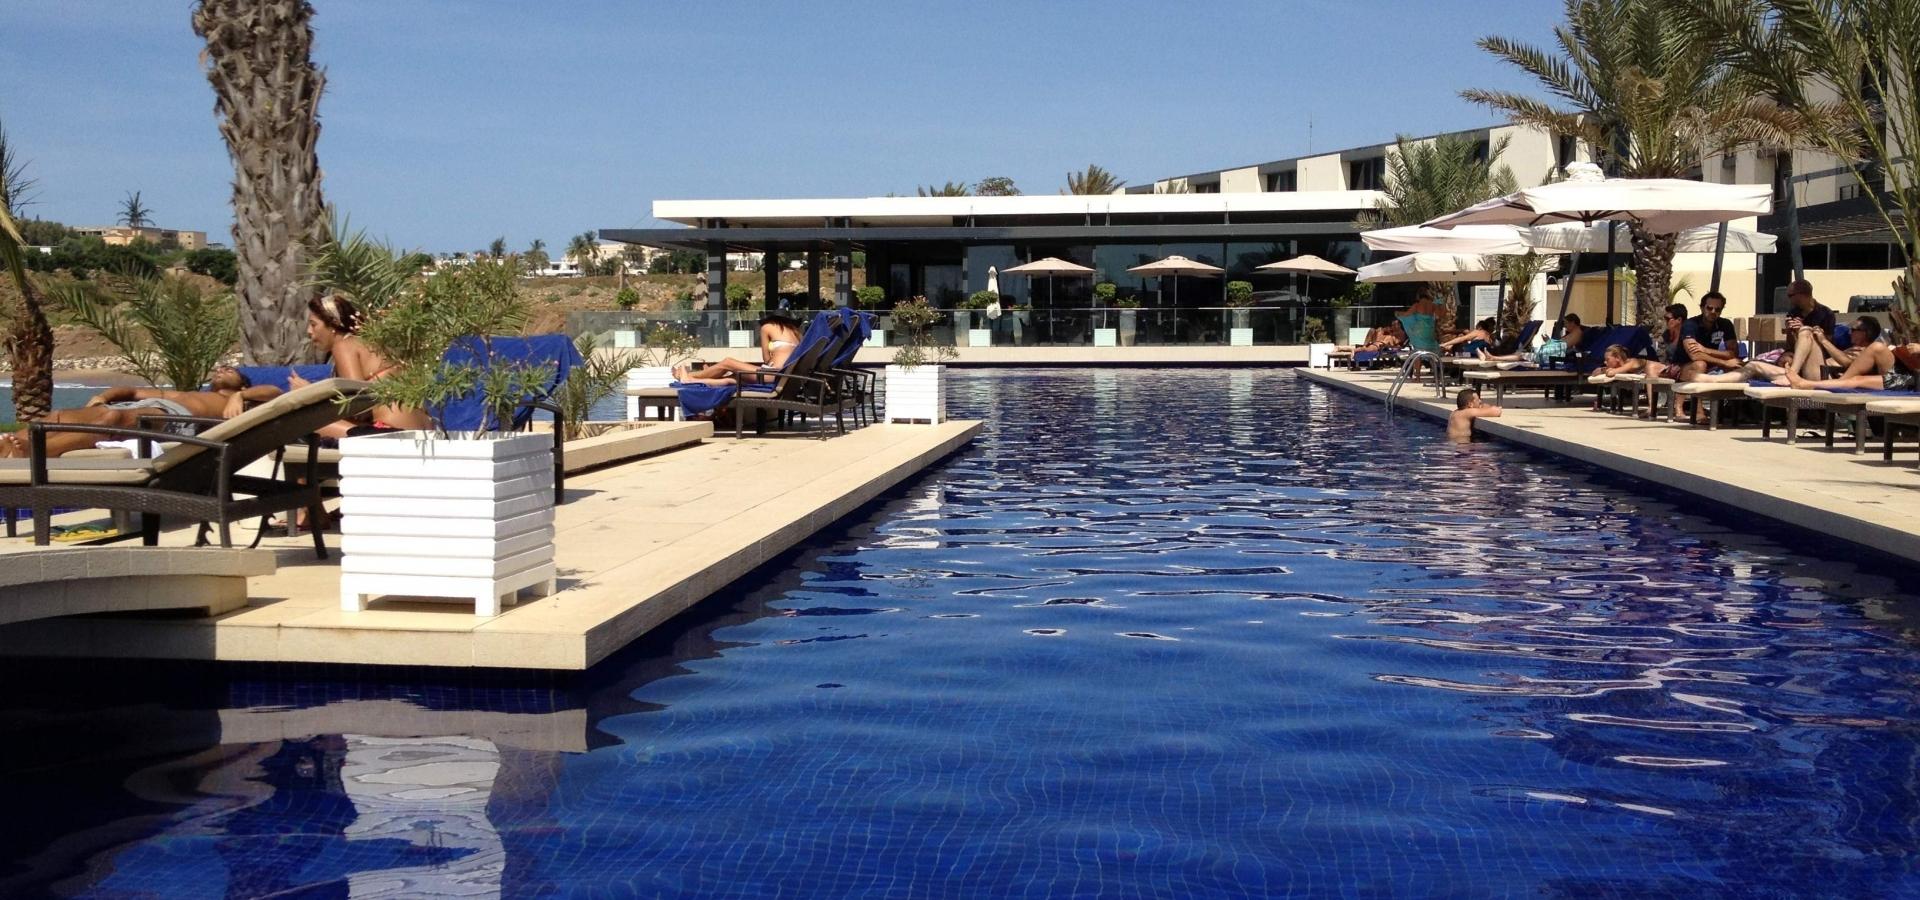 Senegal - Hotel Radisson Blu Dakar